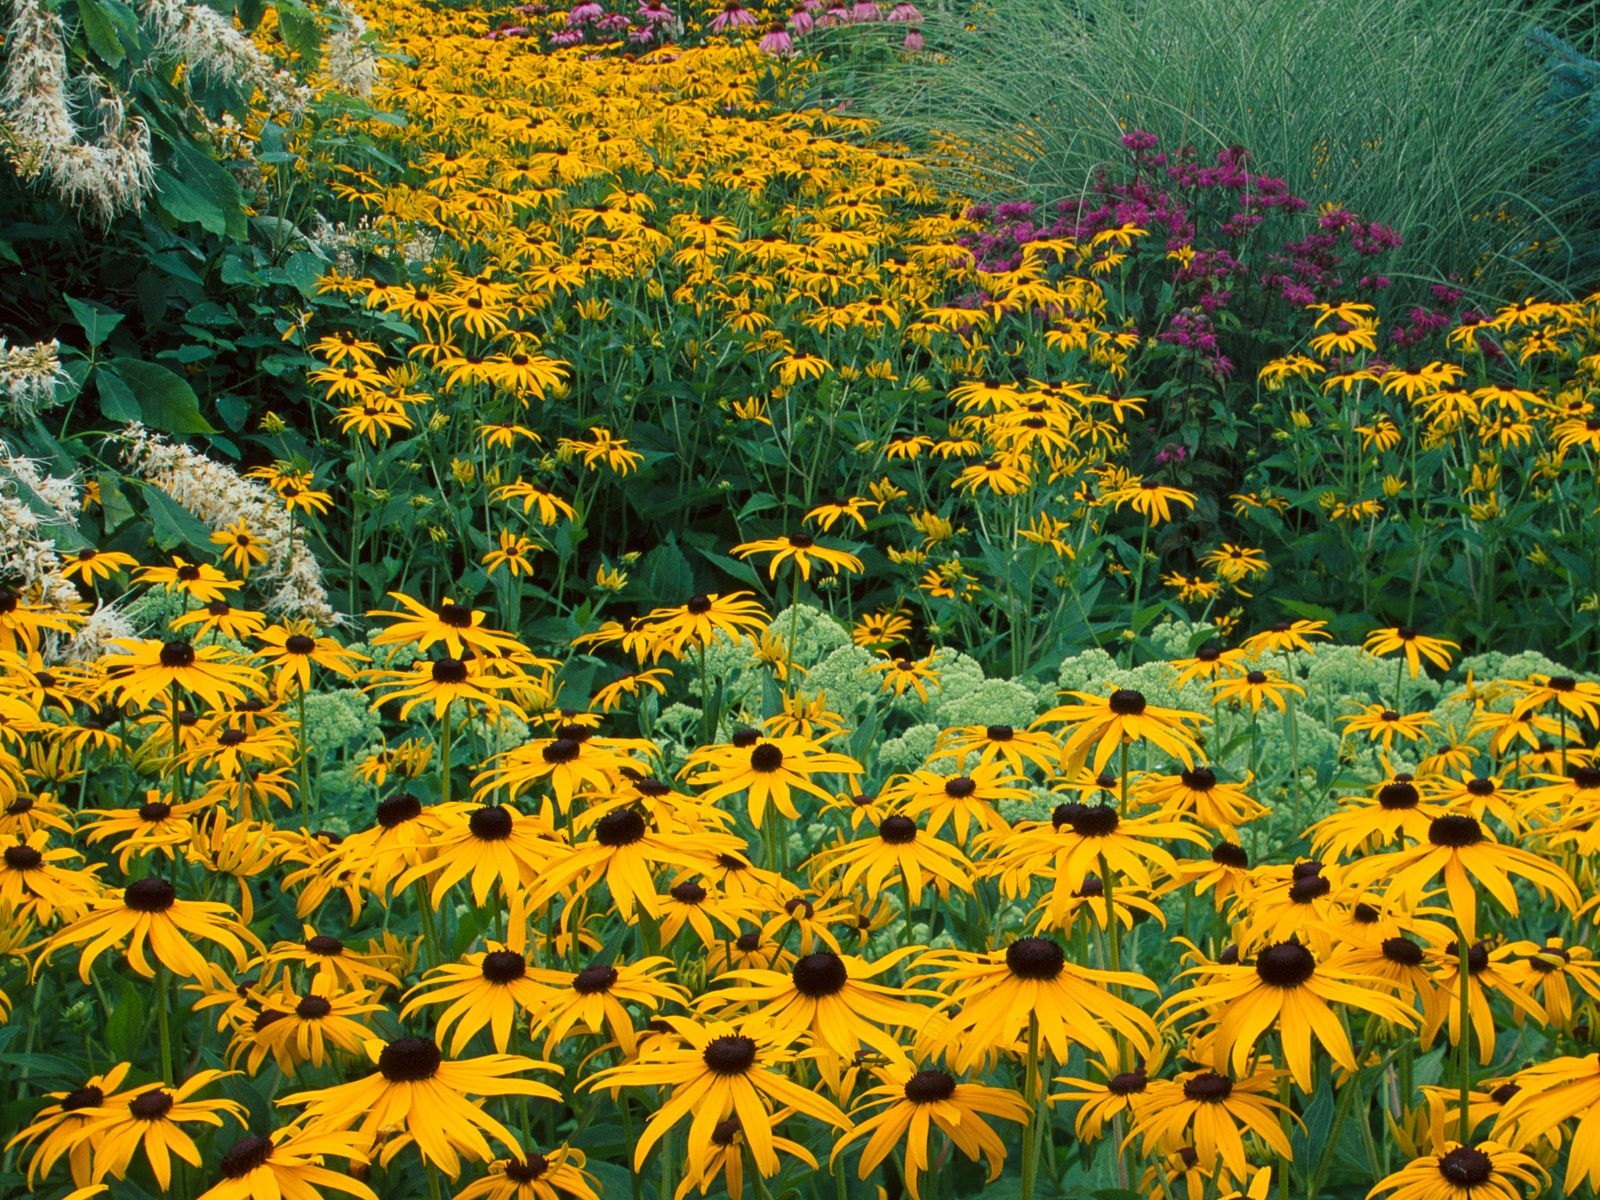 Black-eyed Susans, Holden Arboretum, Ohio